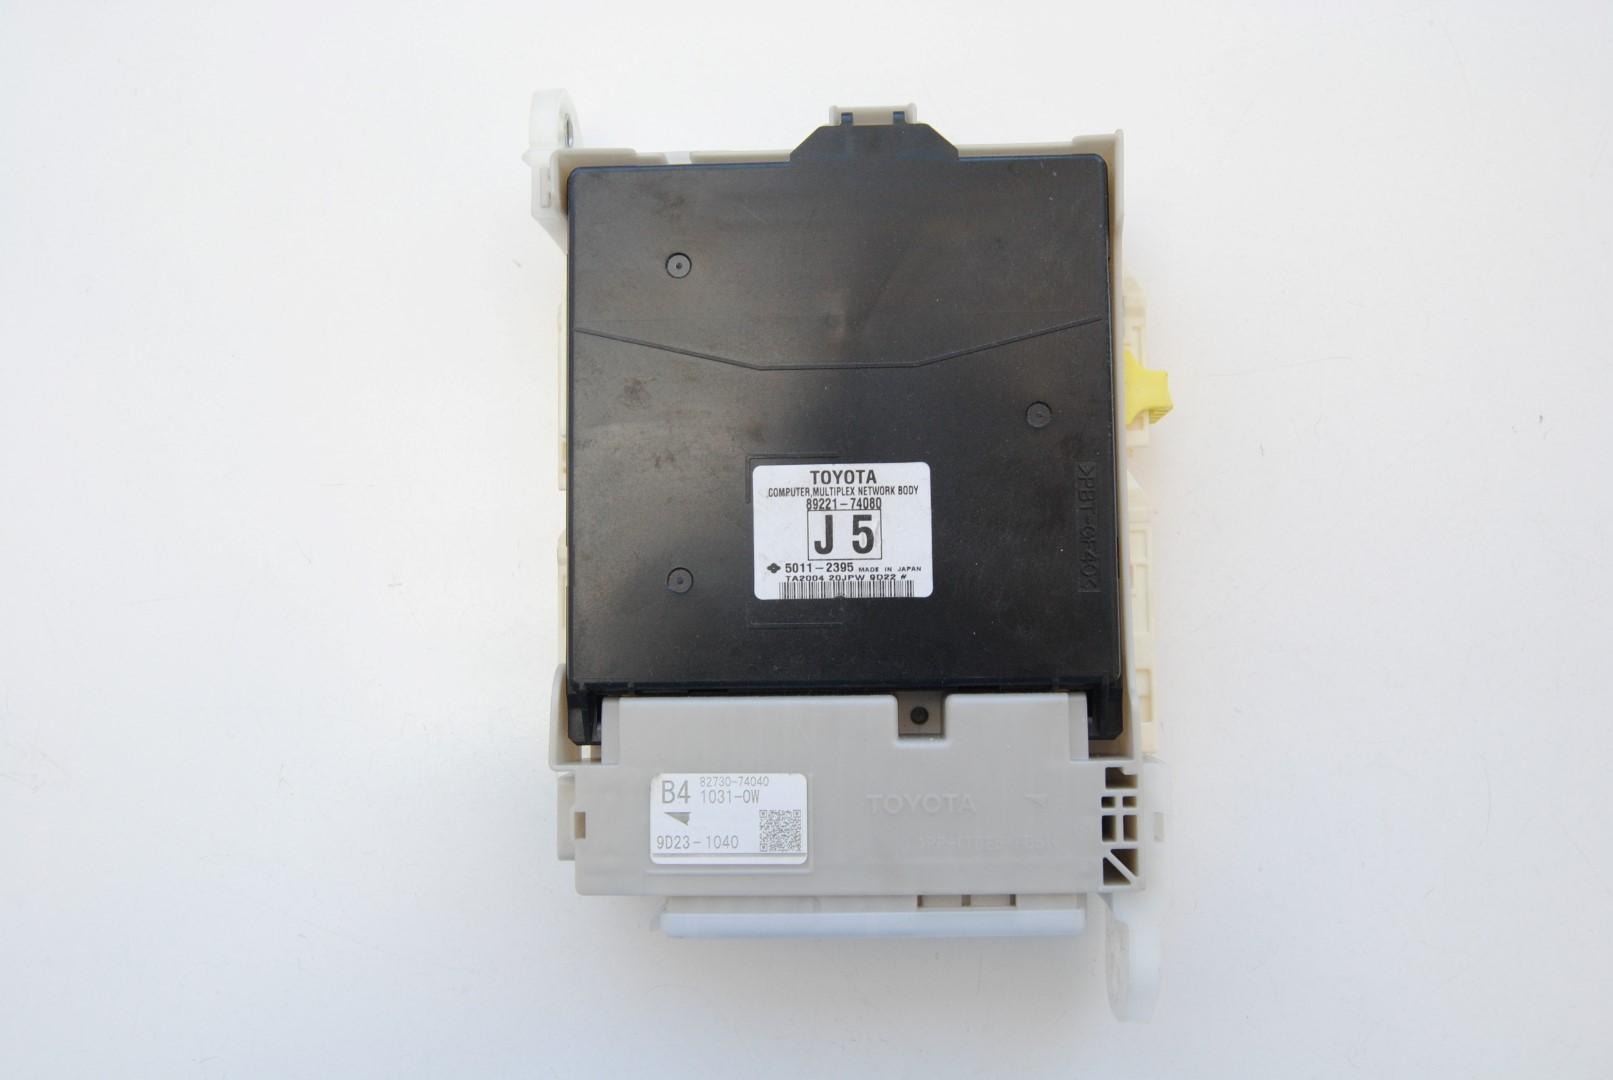 1937502 hyundai i20 2014 rhd multiplex network body control fuse box 82730  at reclaimingppi.co